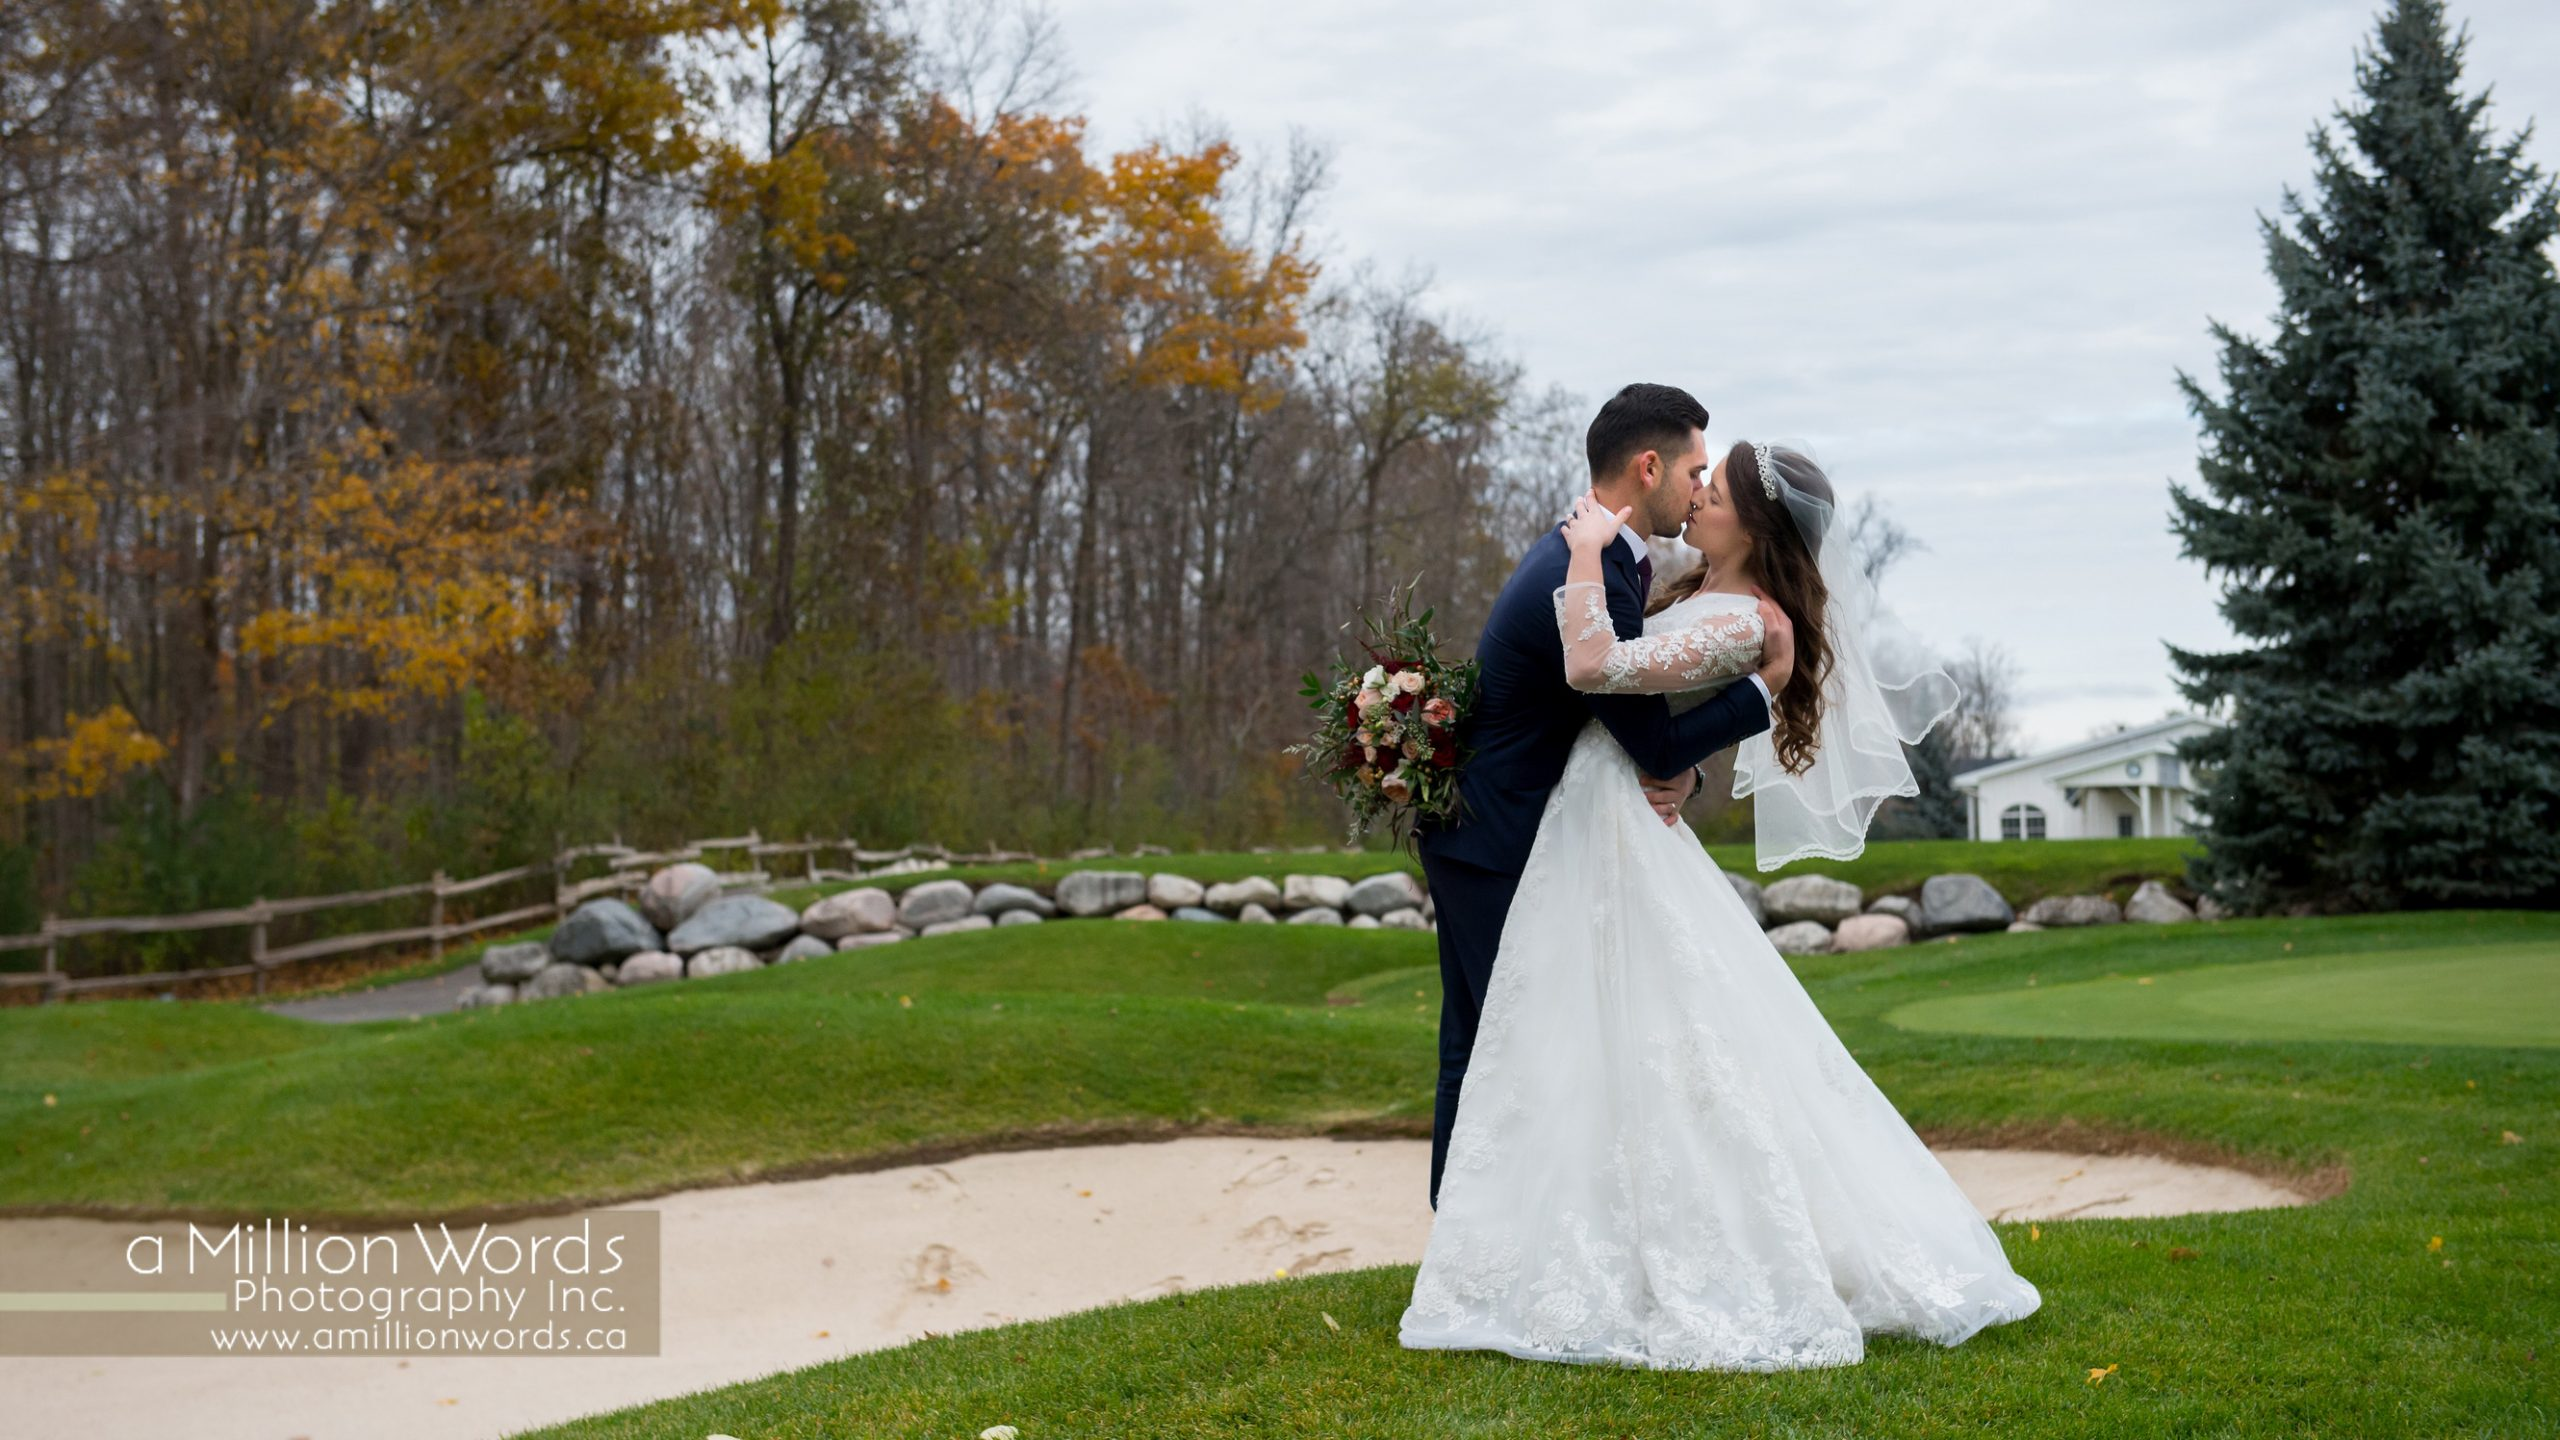 cambridge_afternoon_wedding_photography26